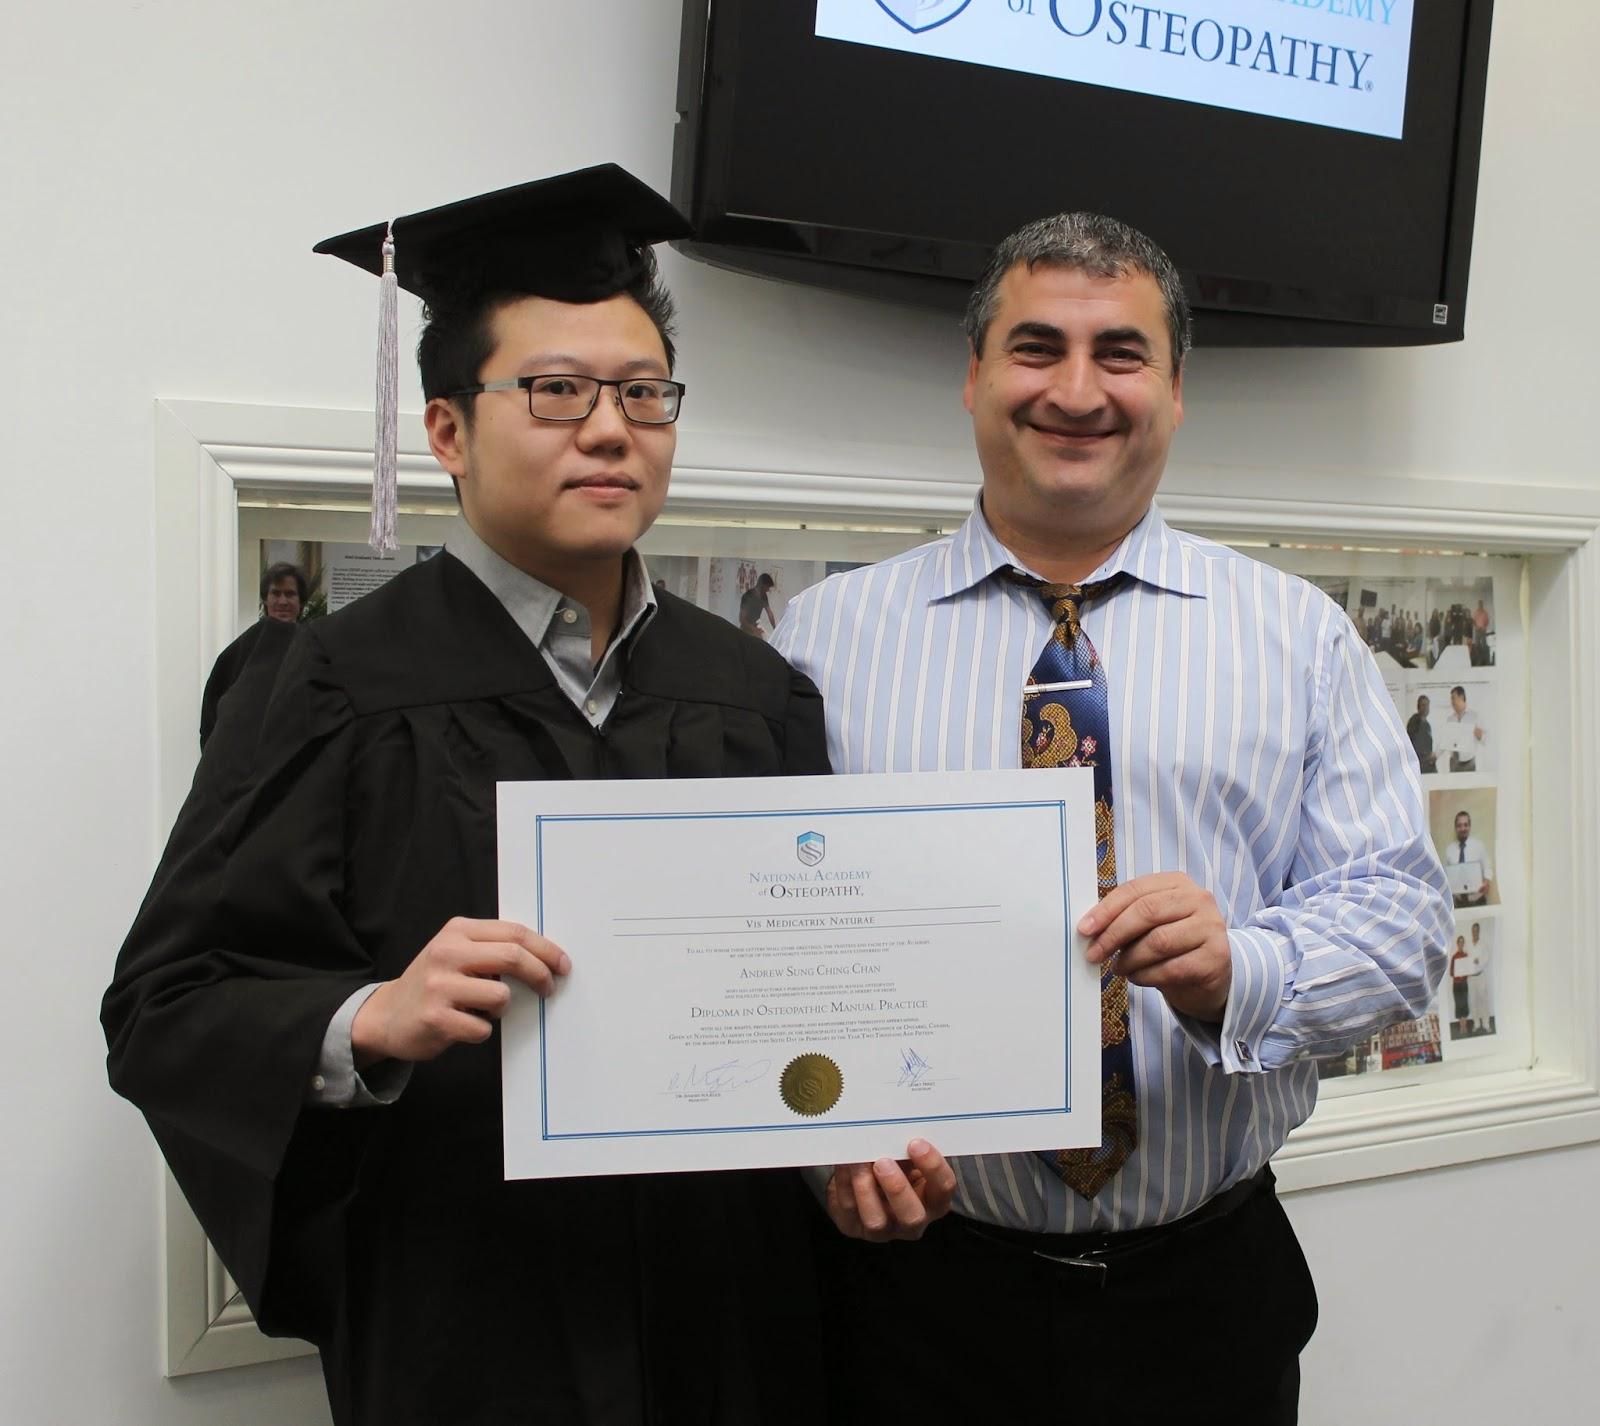 National Academy of Osteopathy (Canada): NAO Graduation Day